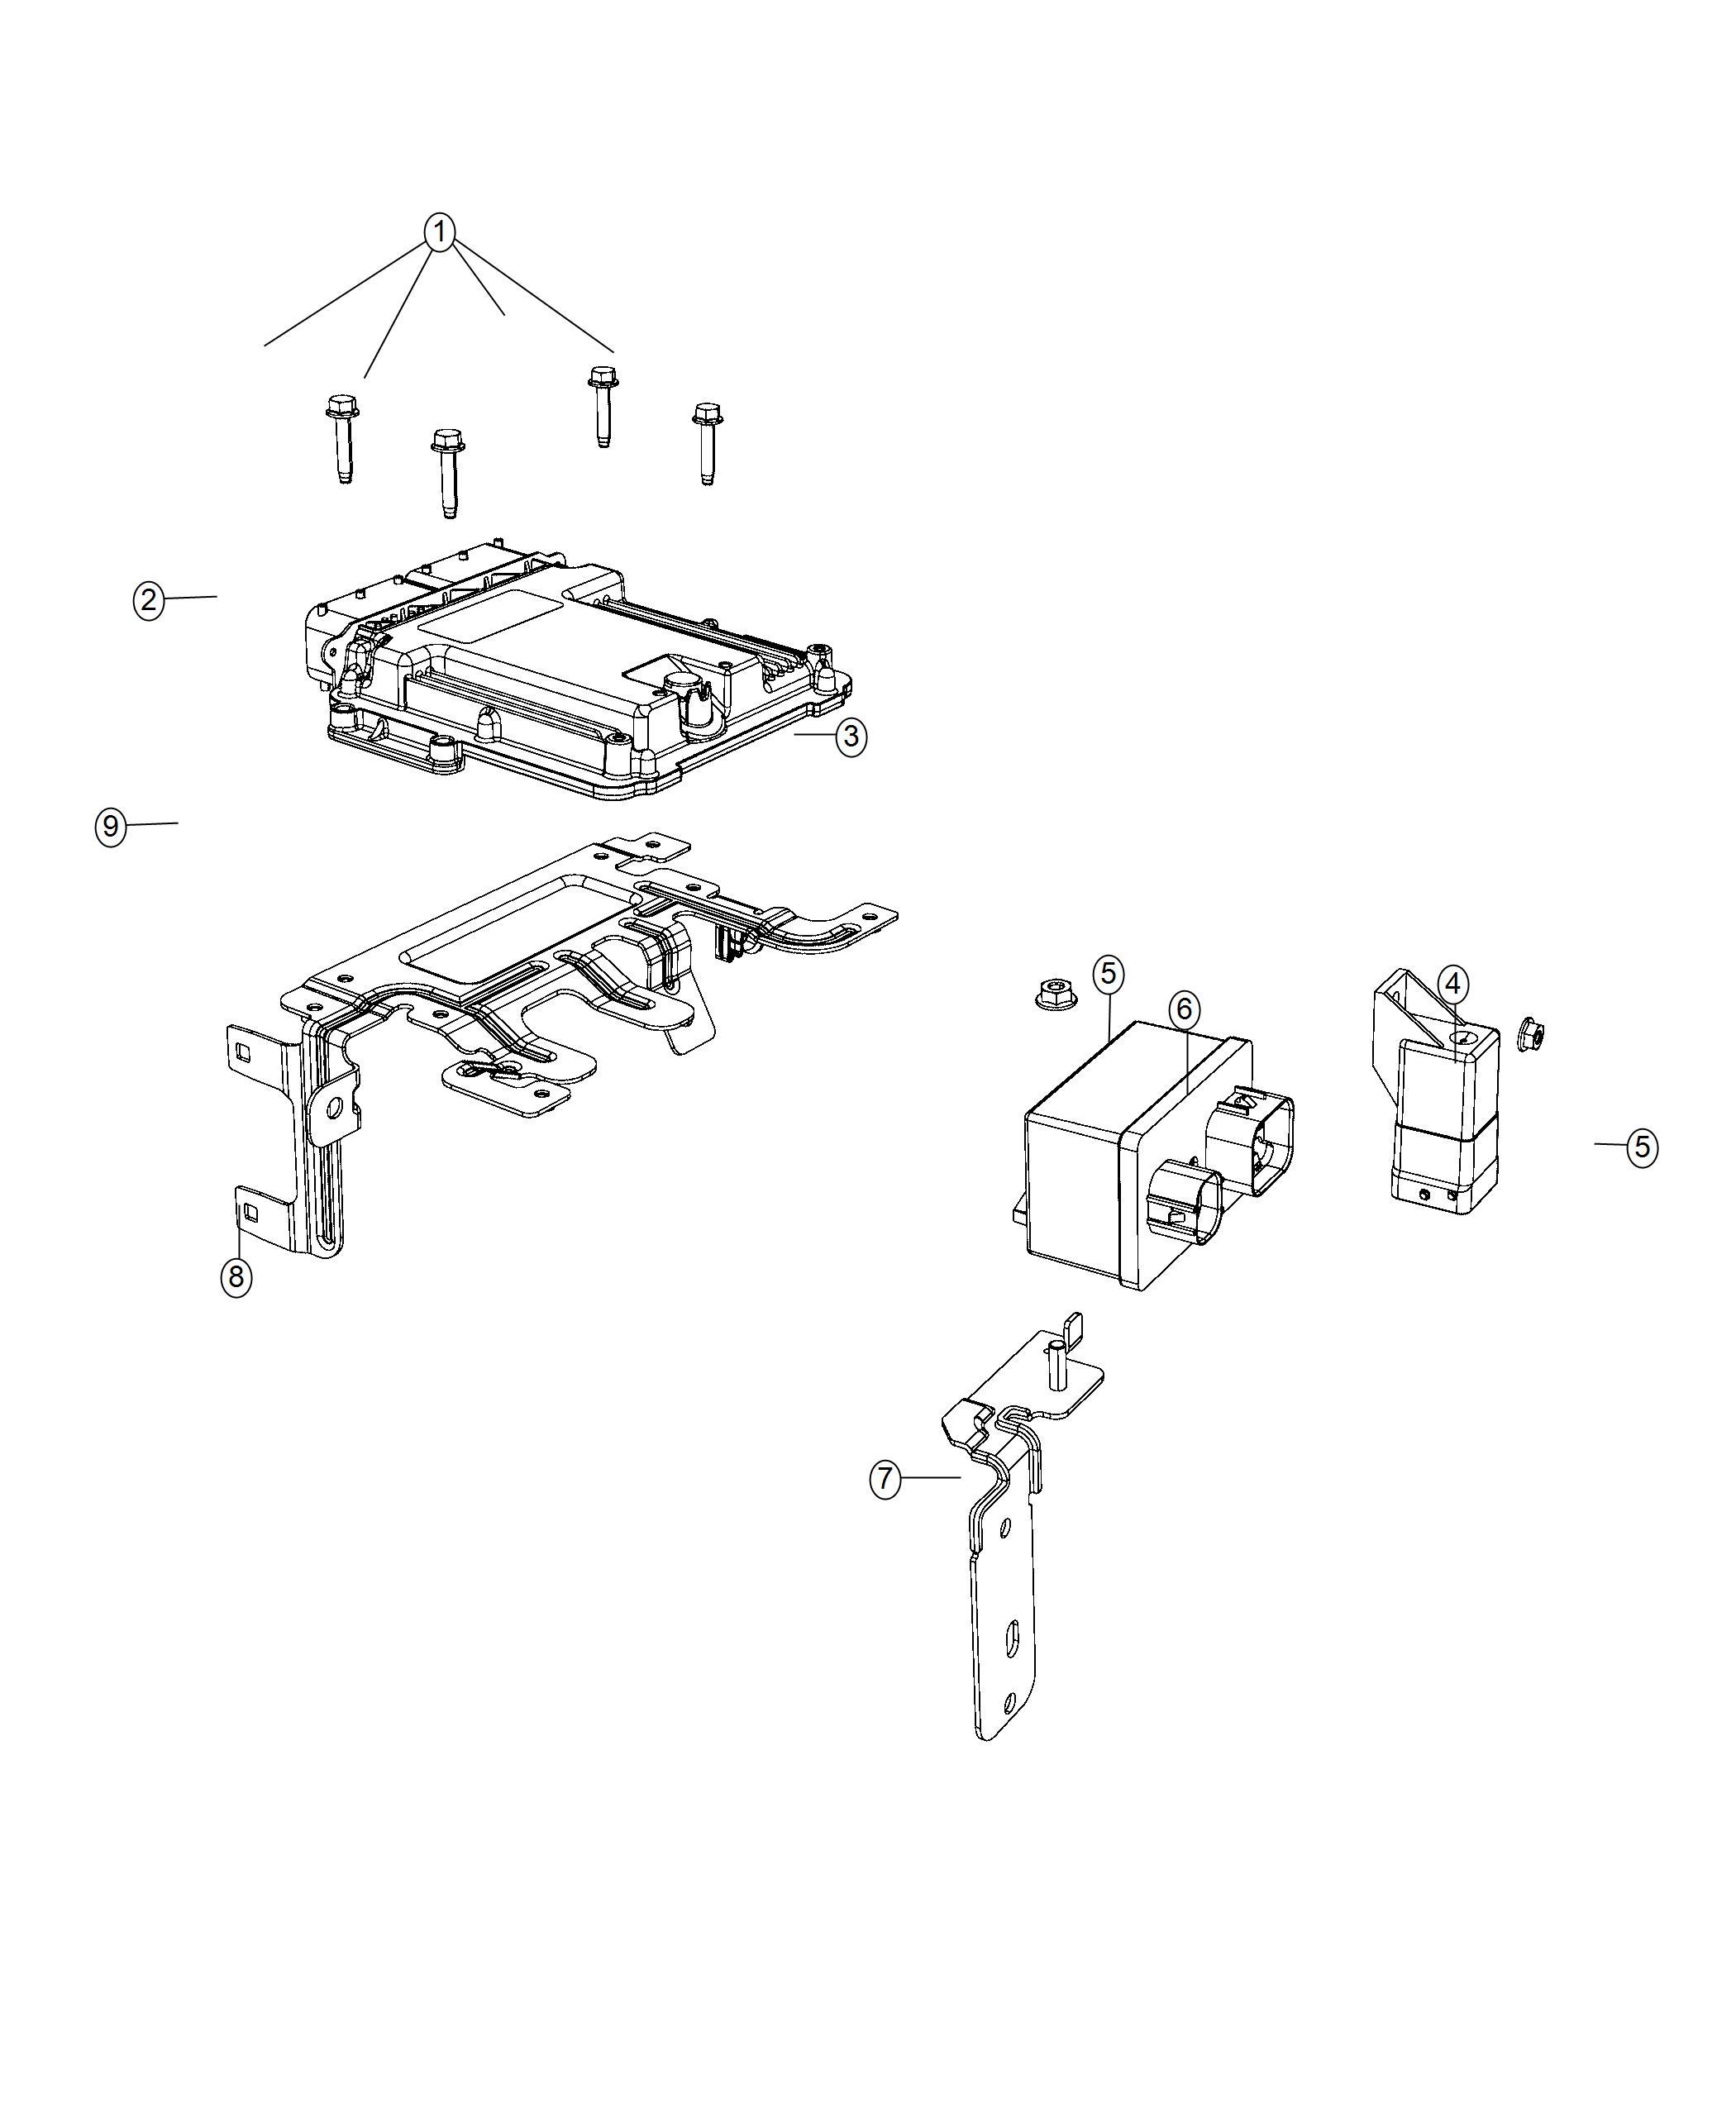 Ram Module Heater Control Selective Catalytic